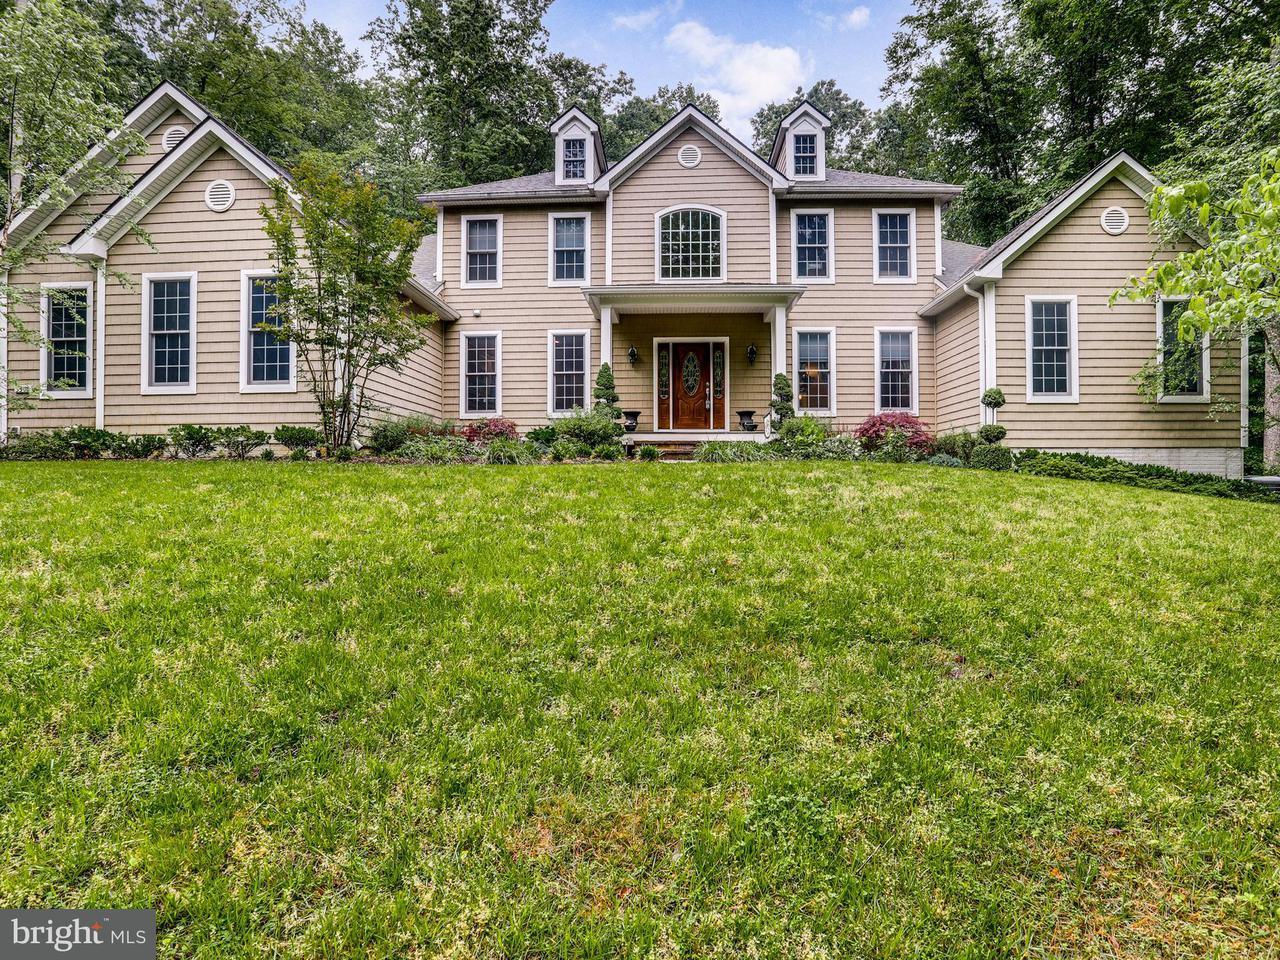 独户住宅 为 销售 在 3301 CHURCHILL FARM Road 3301 CHURCHILL FARM Road Davidsonville, 马里兰州 21035 美国